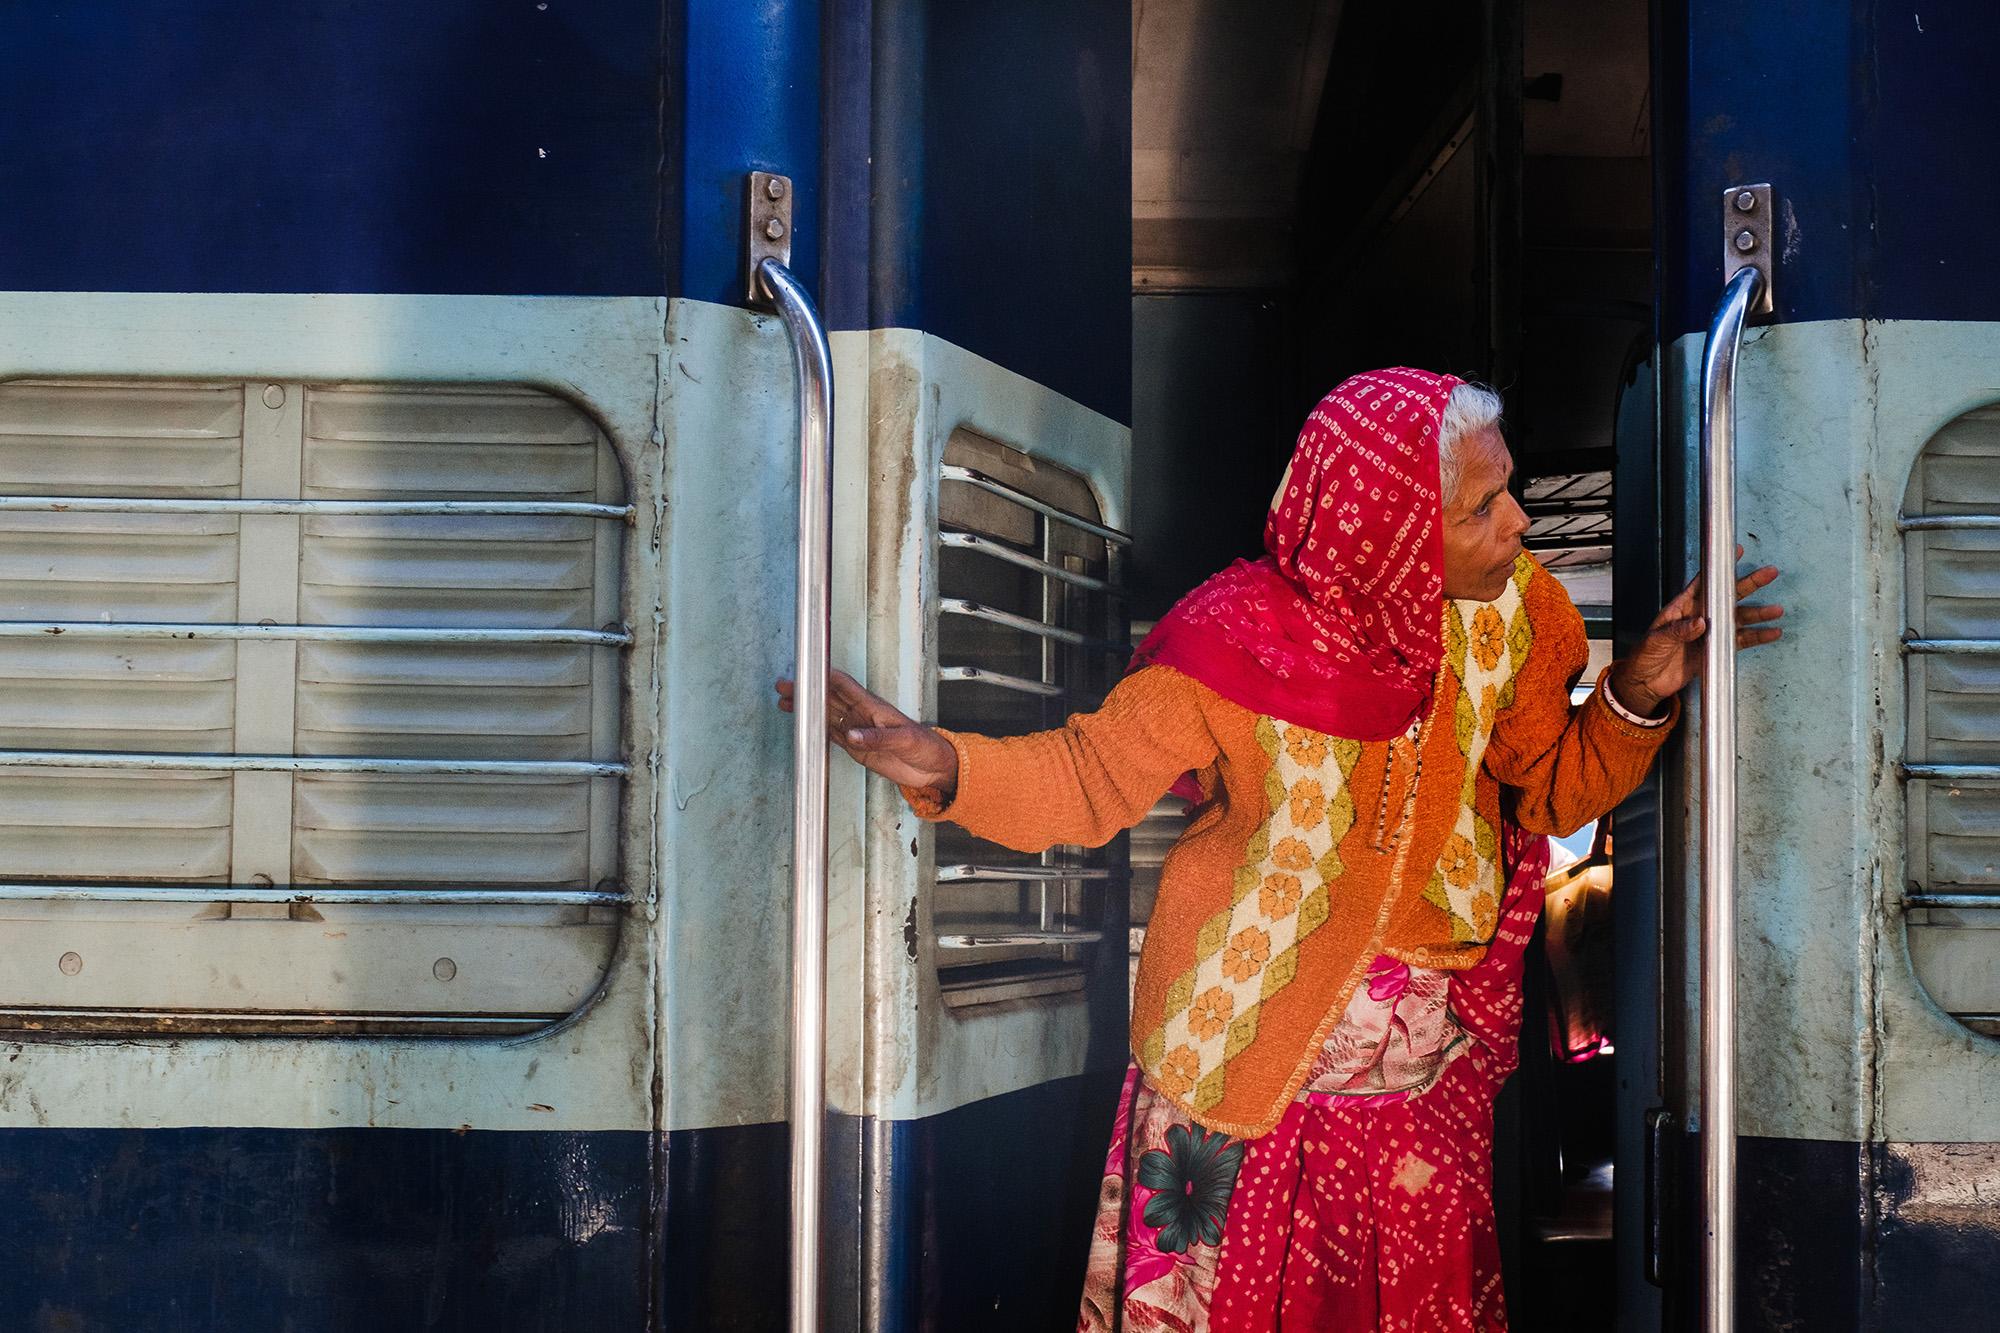 AnjaPoehlmann_India-Jodhpur_066.jpg